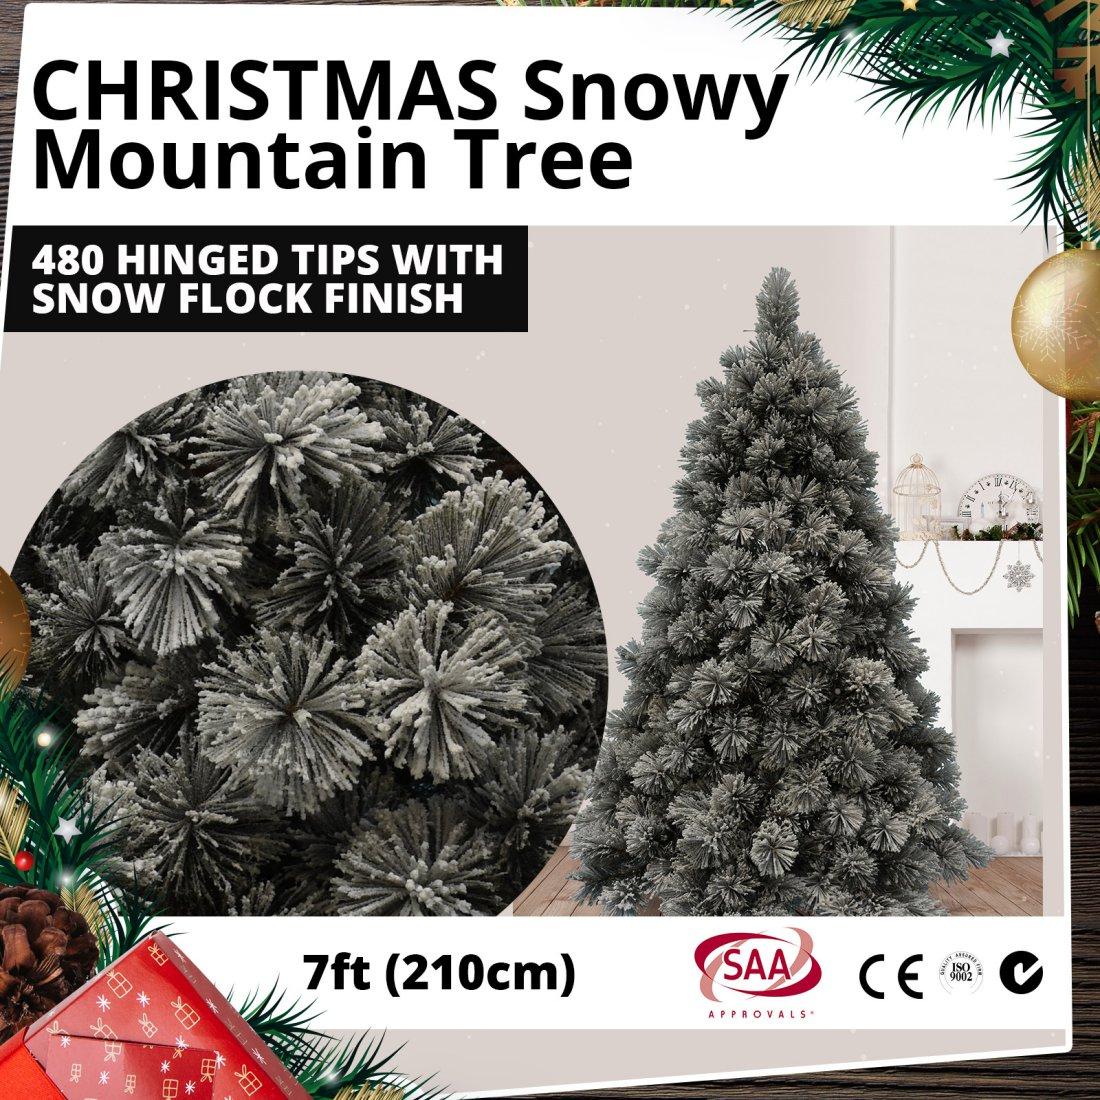 Snow Flocked Christmas Tree 210cm 7ft - Snowy Mountain